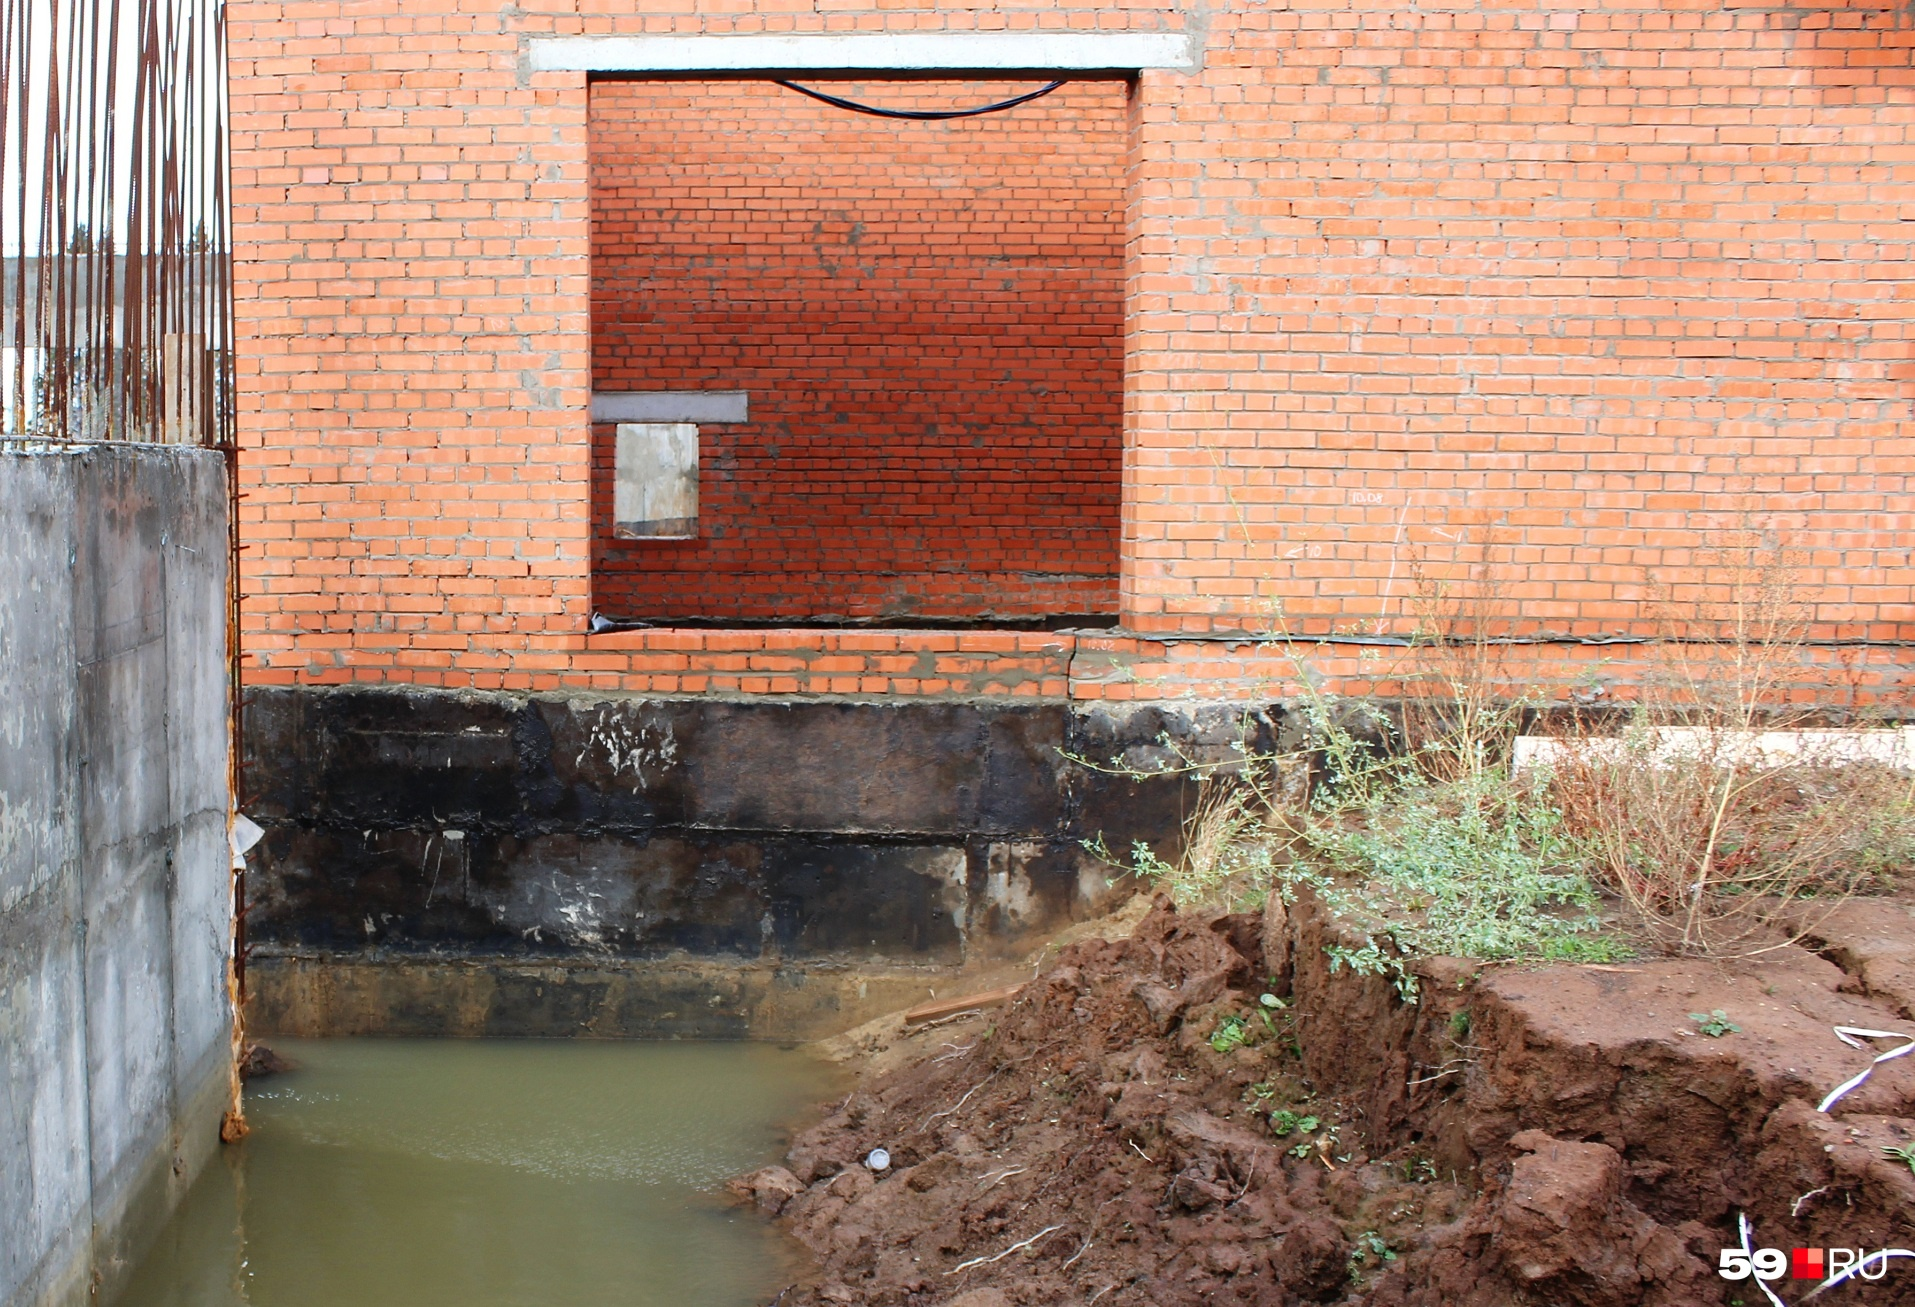 На кирпичной стене над фундаментом видна трещина